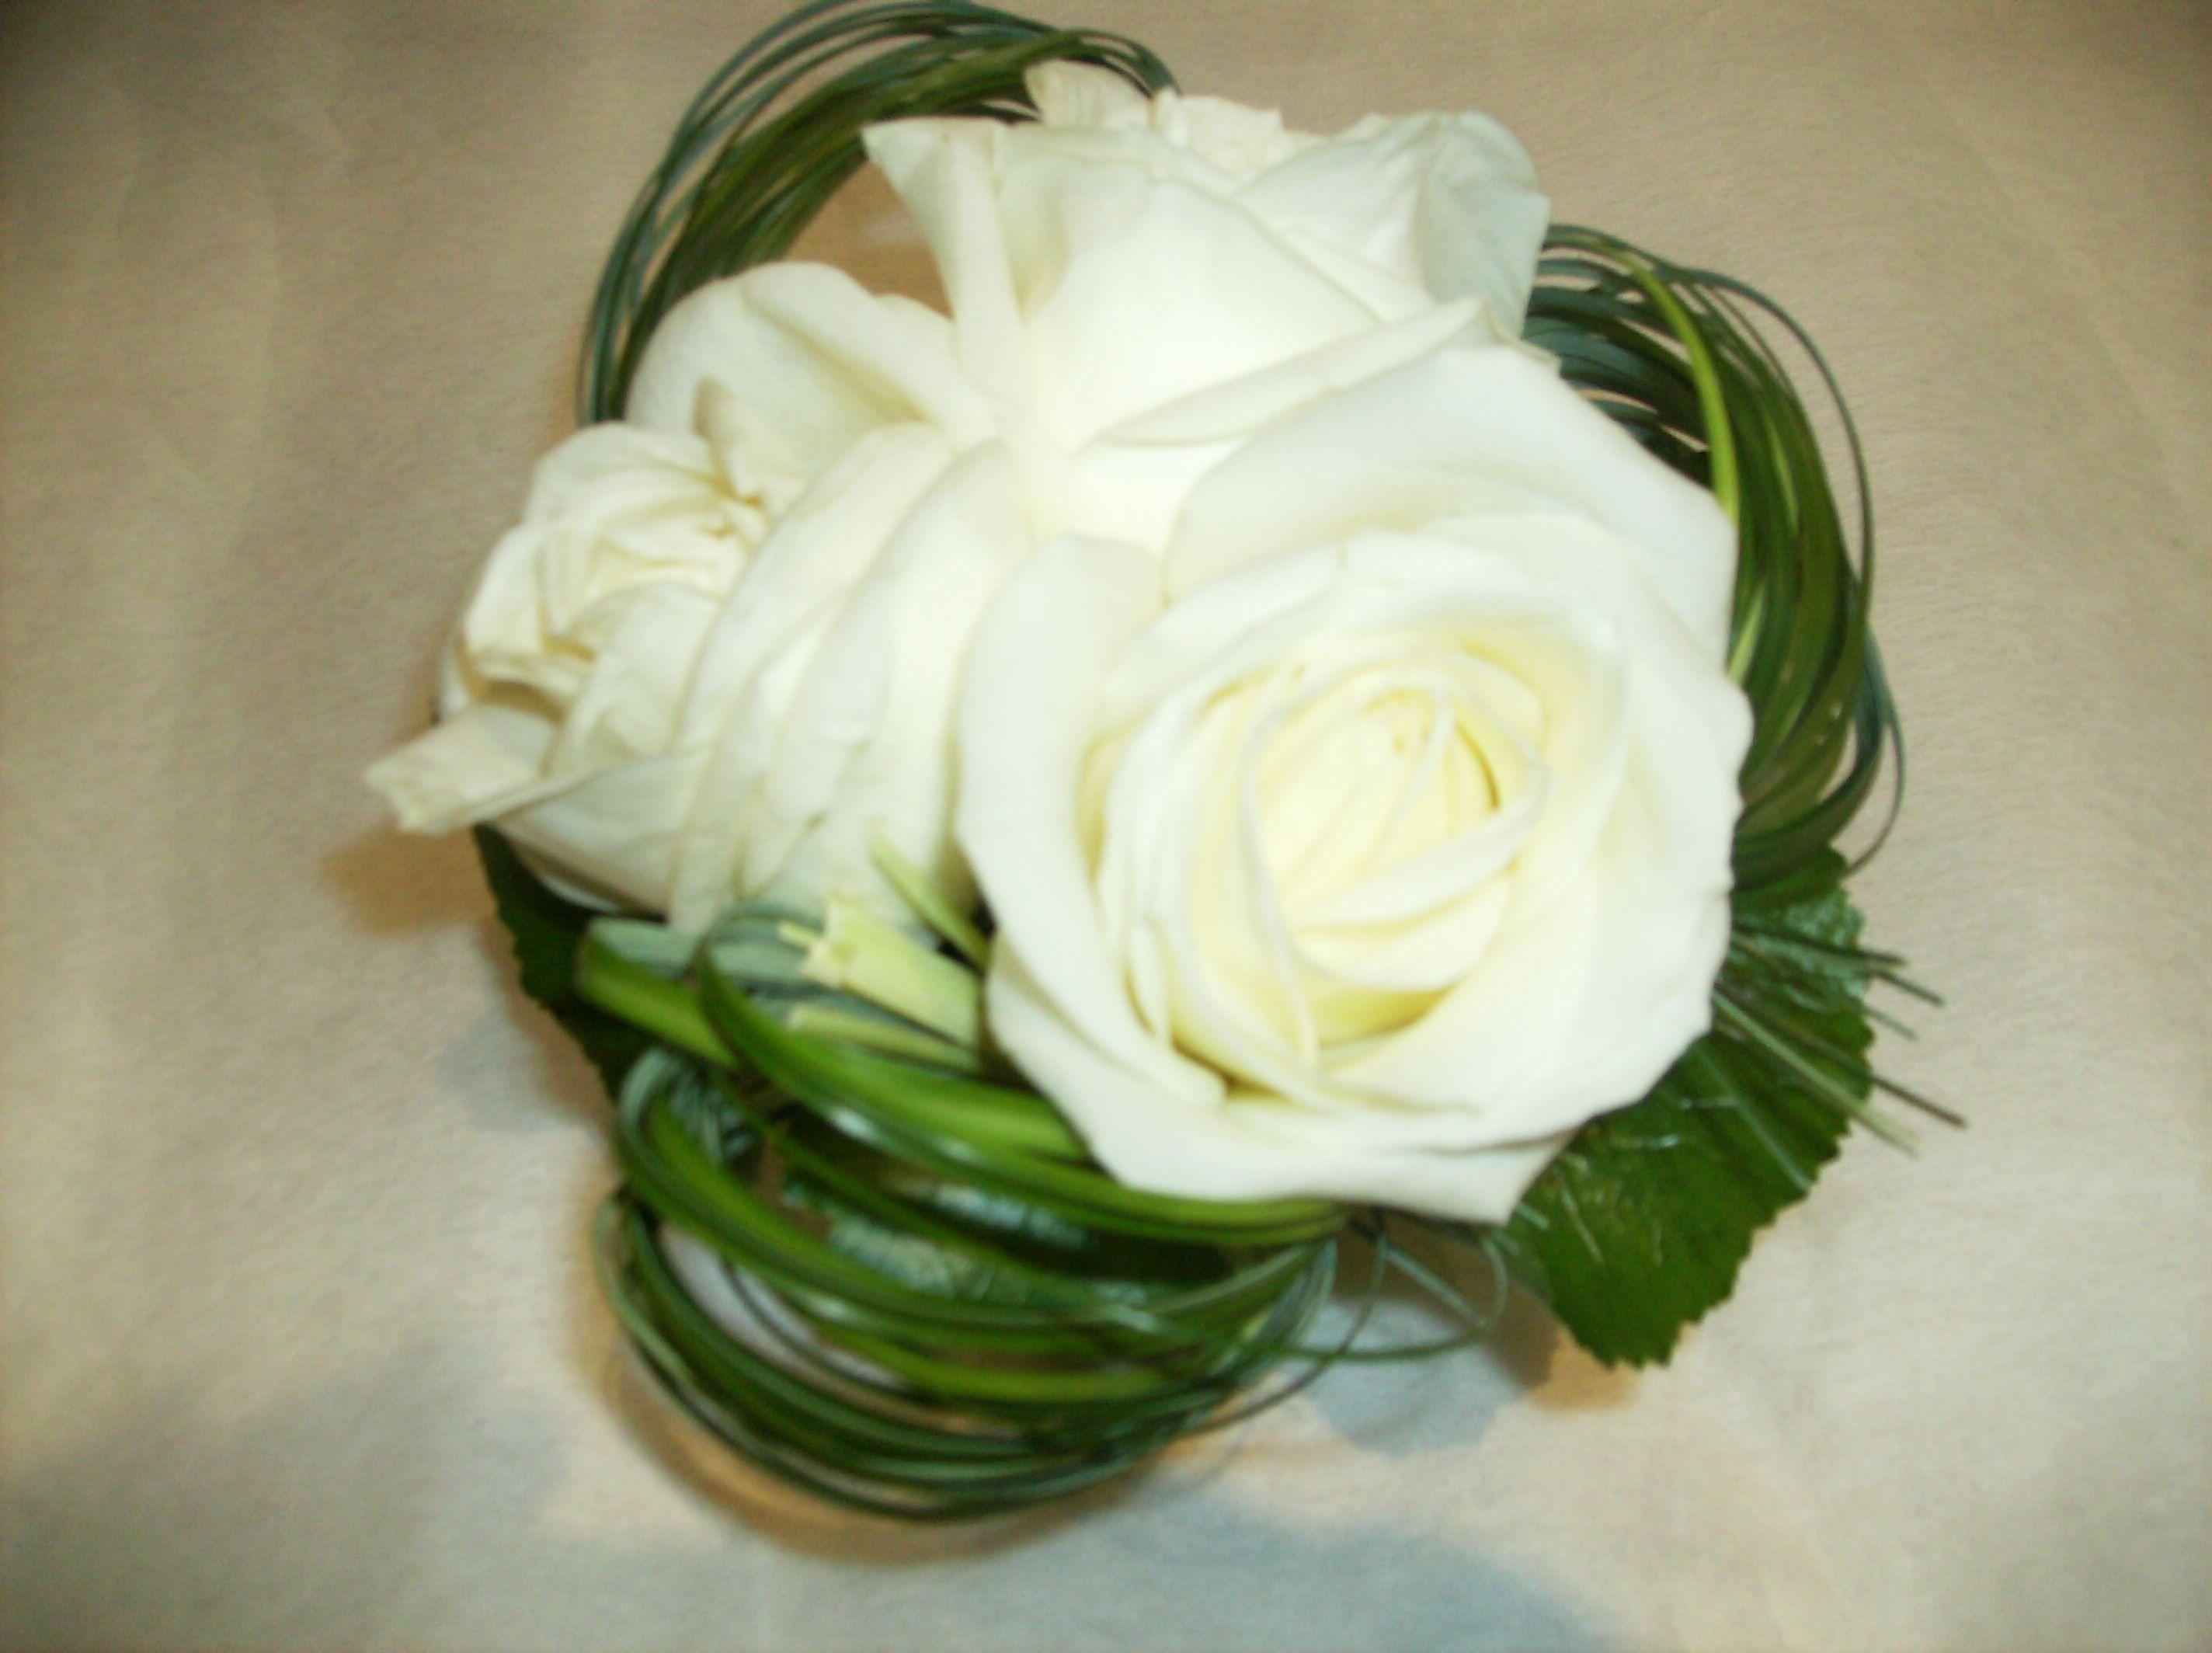 Fleurs Blanches Mariage Centre De Table Fleurs Blanches Mariage